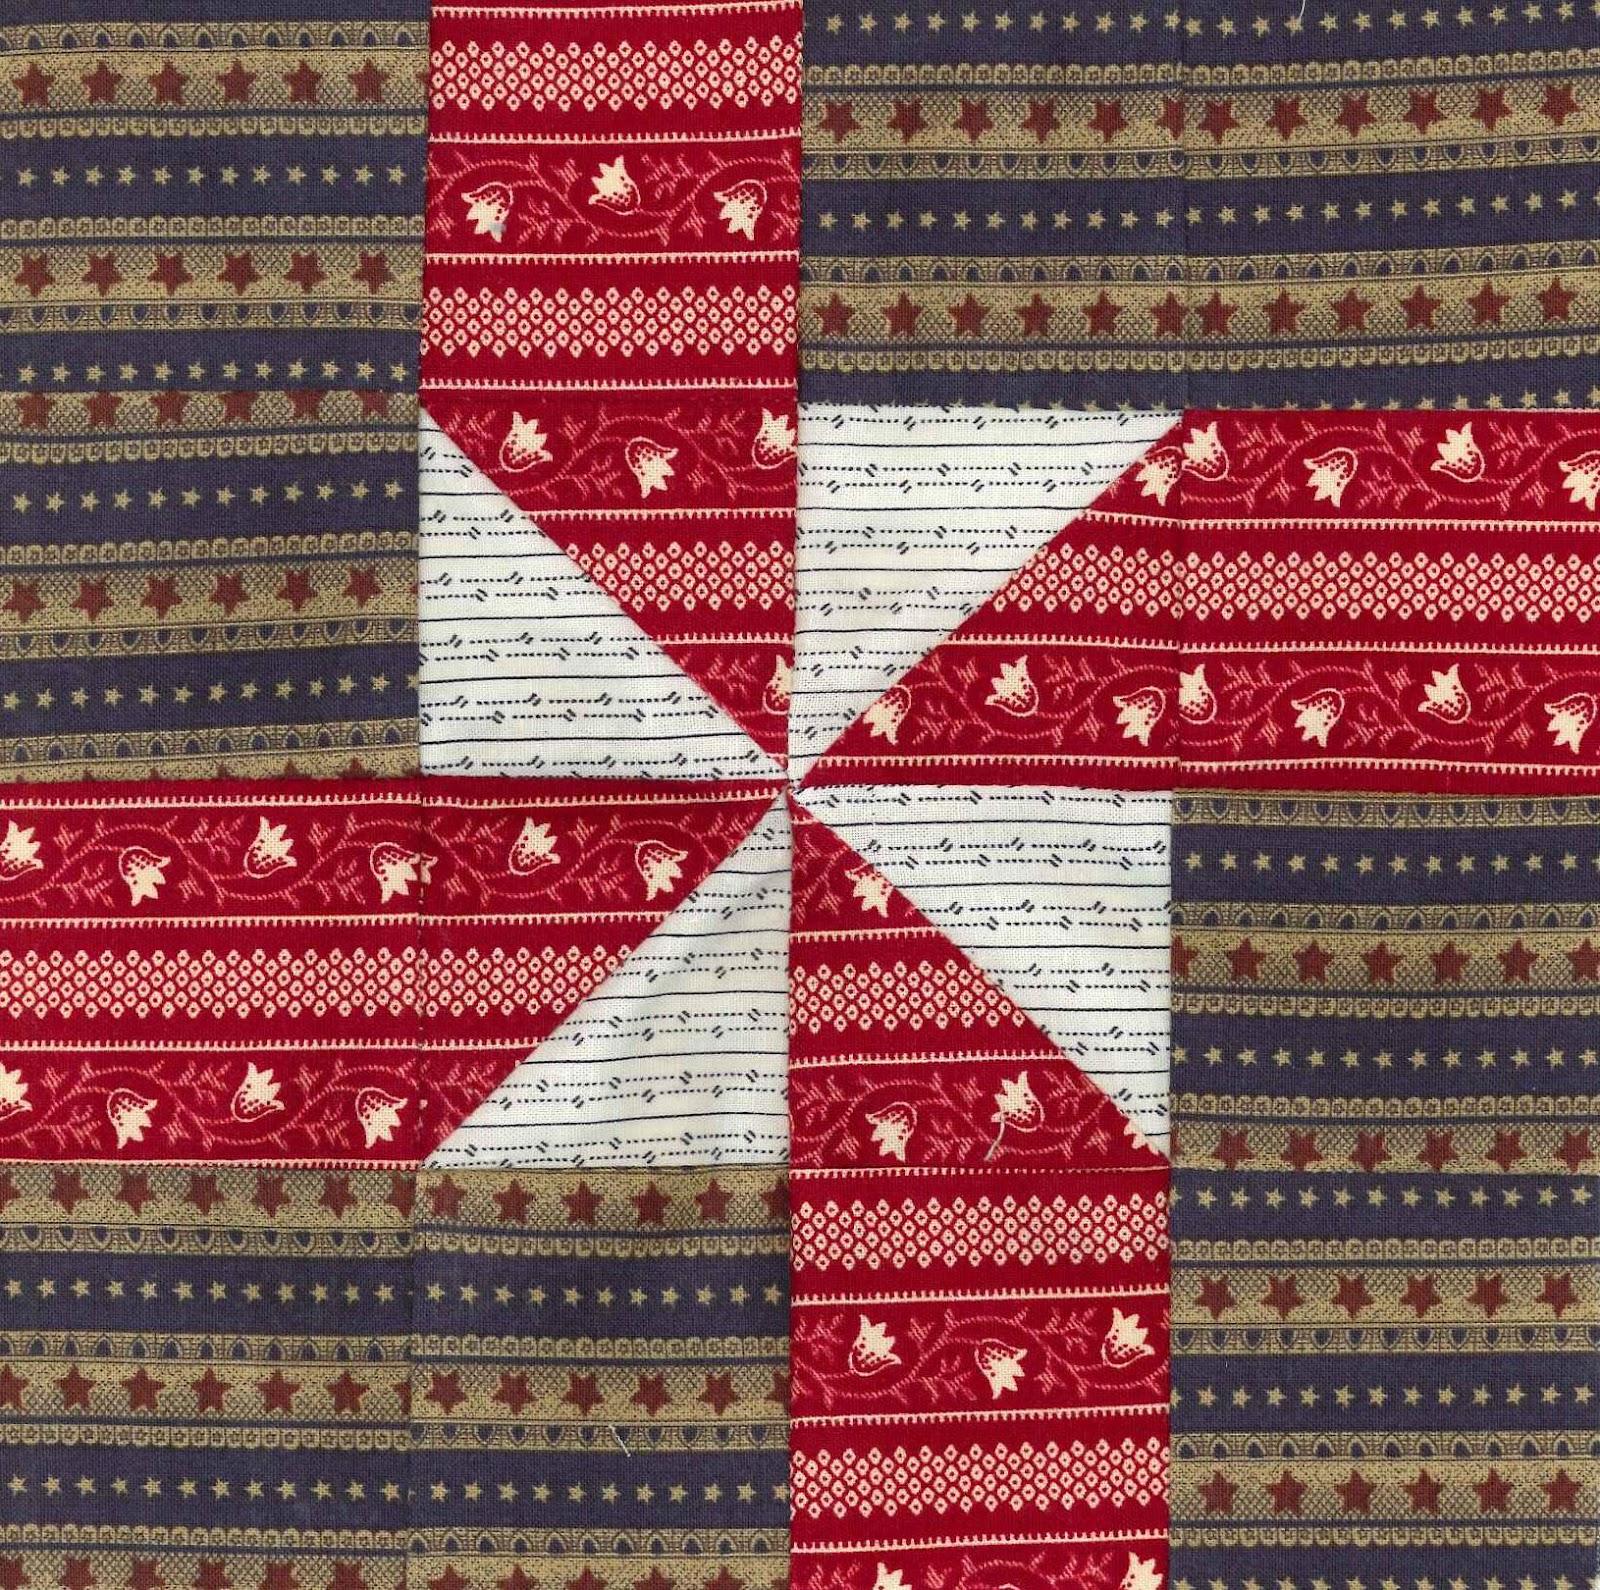 Clmt Quilter Barbara Brackman S Civil War Quilt Blocks